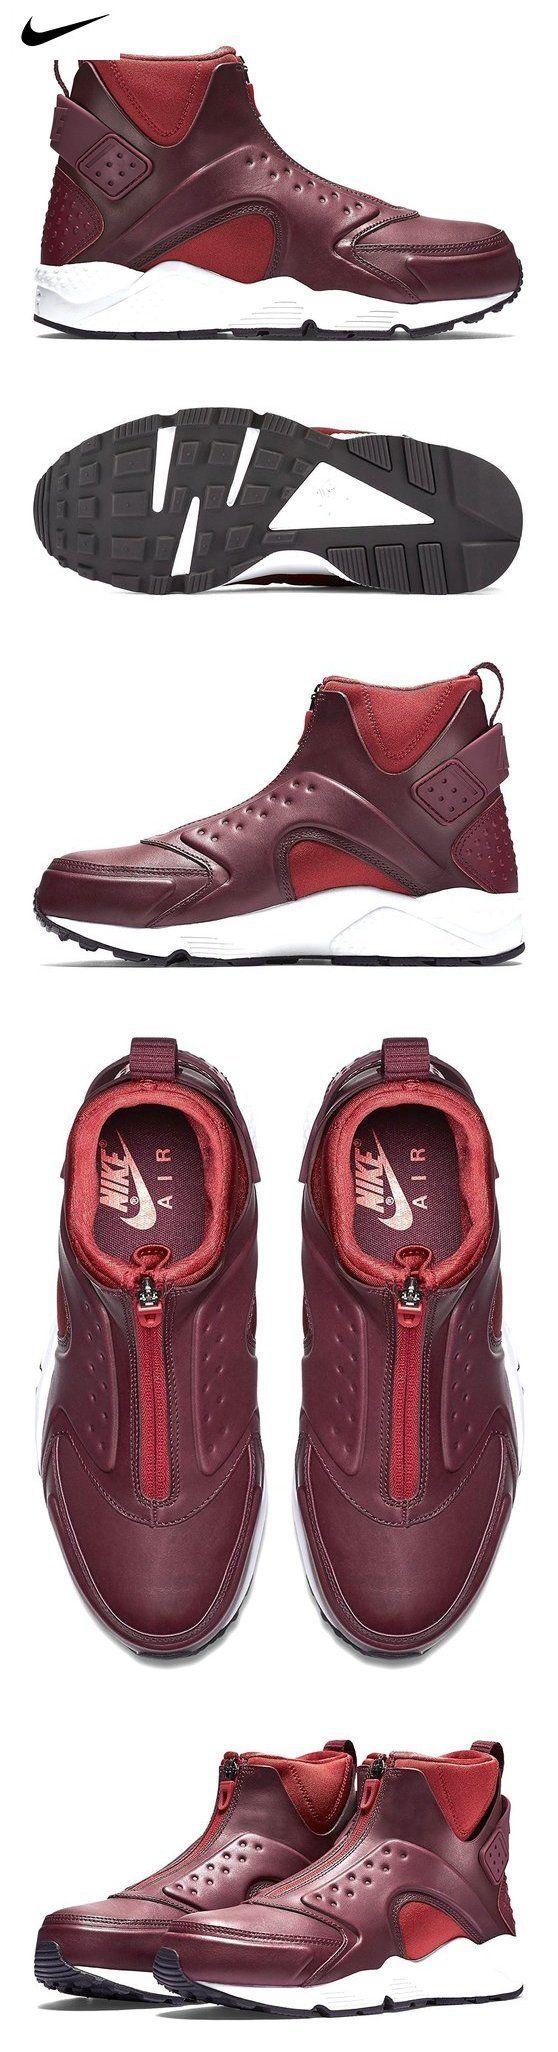 f23dc4943e94 nike air huarache magenta púrpura sneakerdiscount